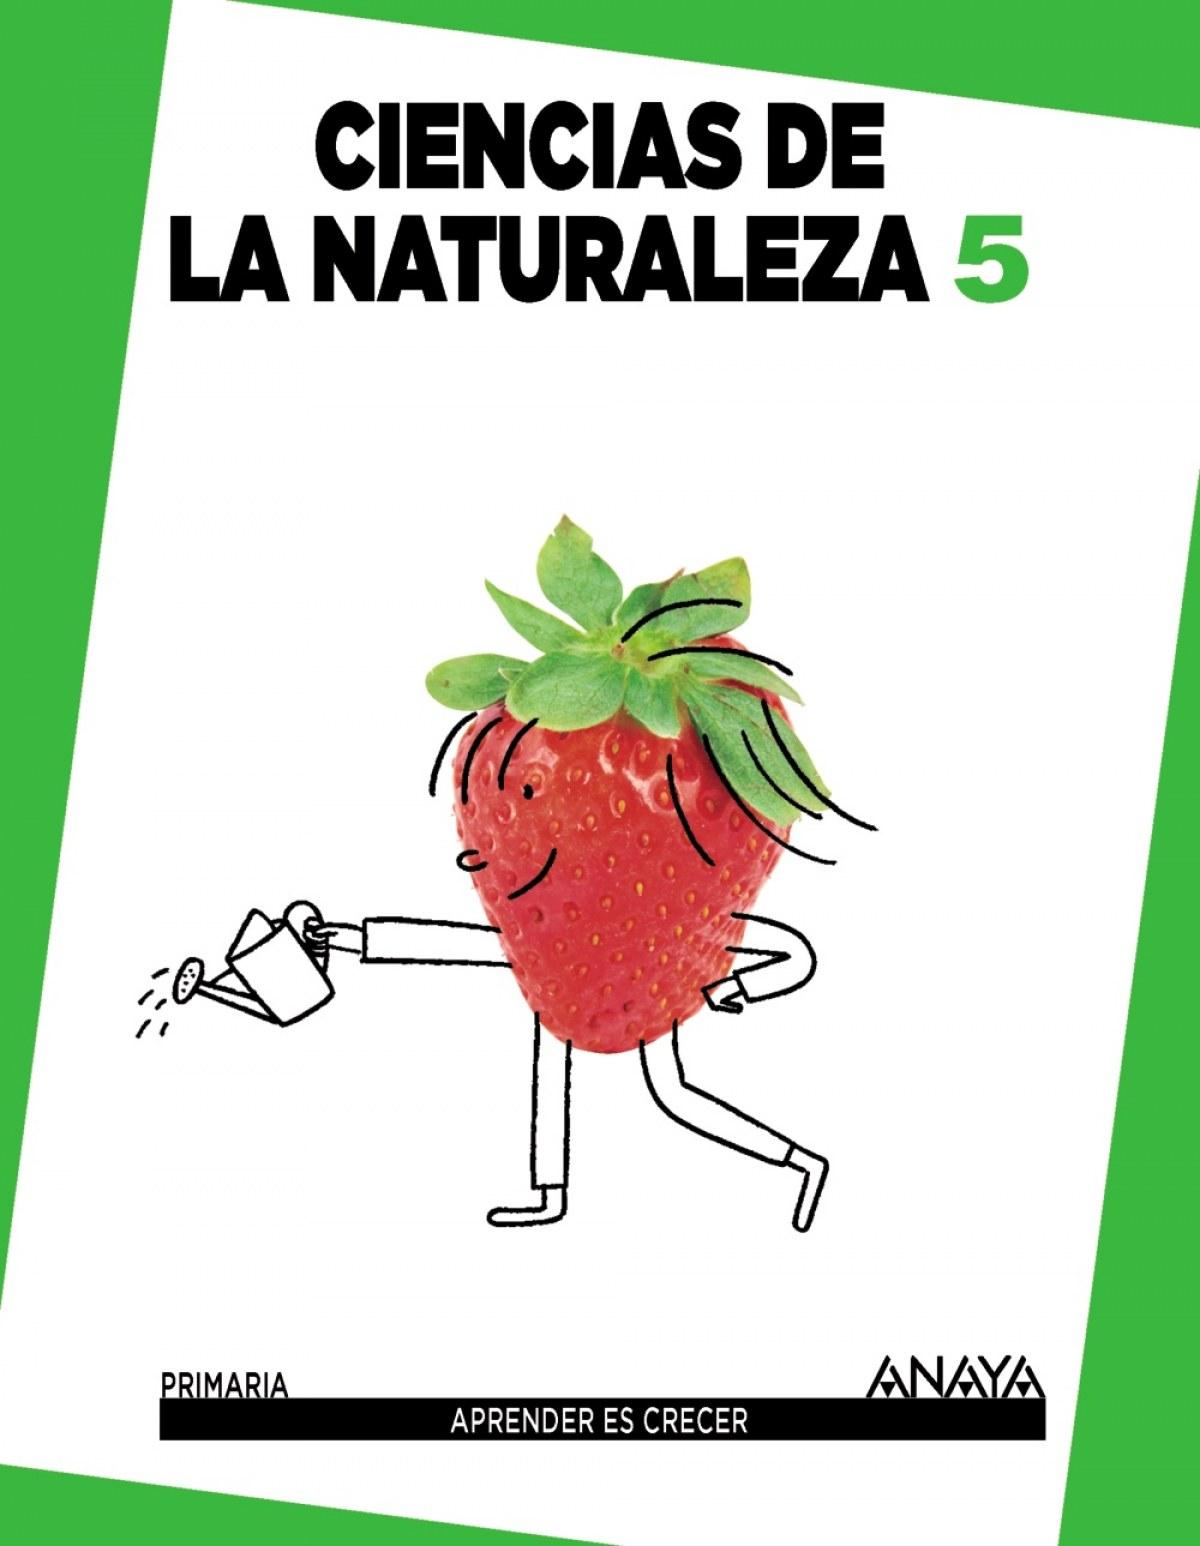 Ciencias Naturaleza 5 Books Abebooks